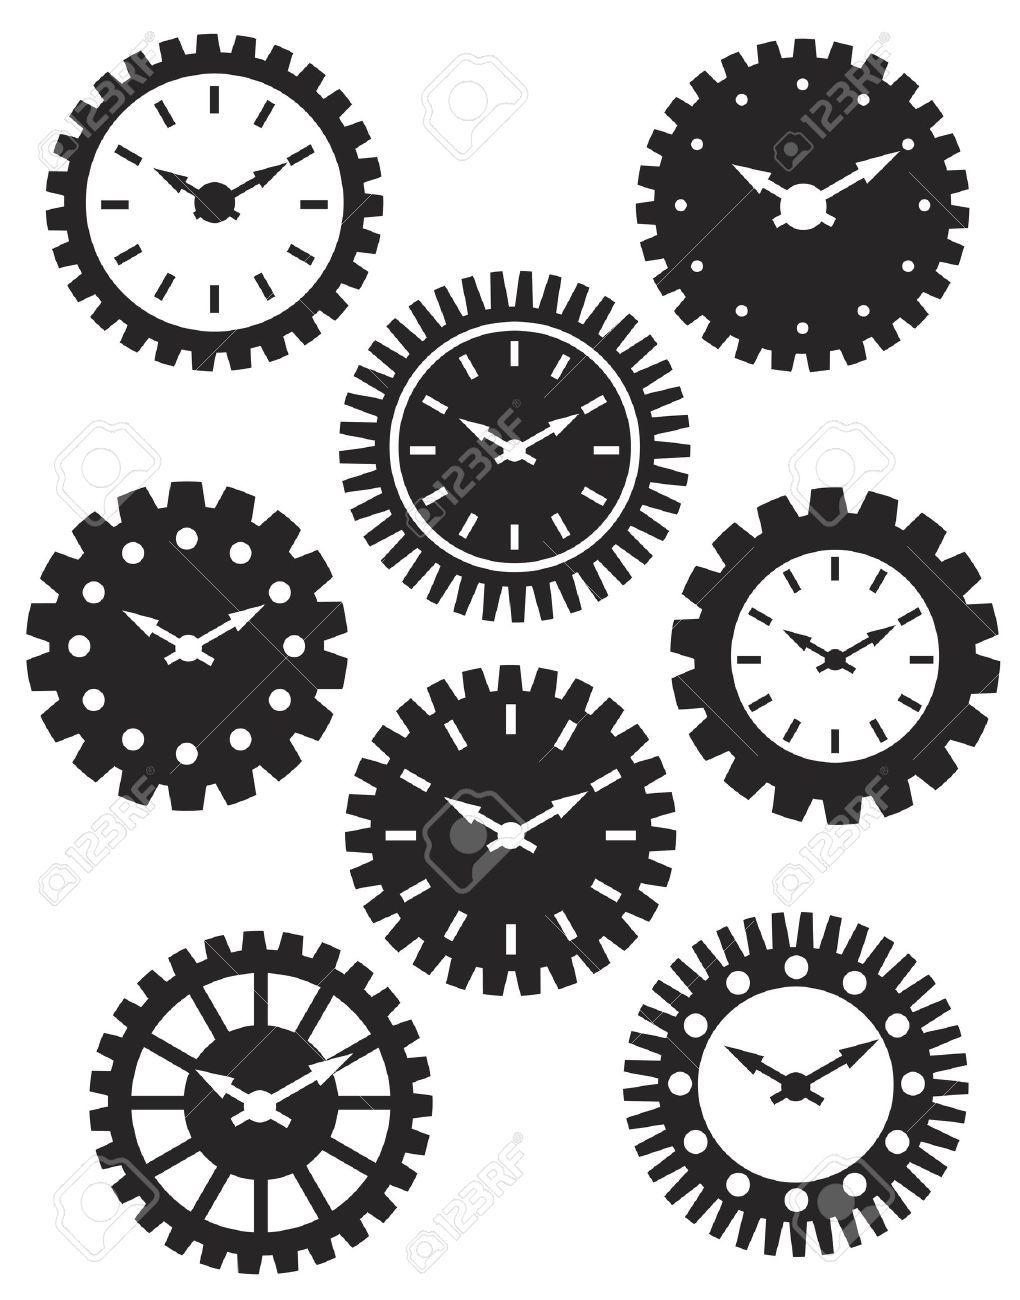 Gears clipart clock. Pin on clocks keys